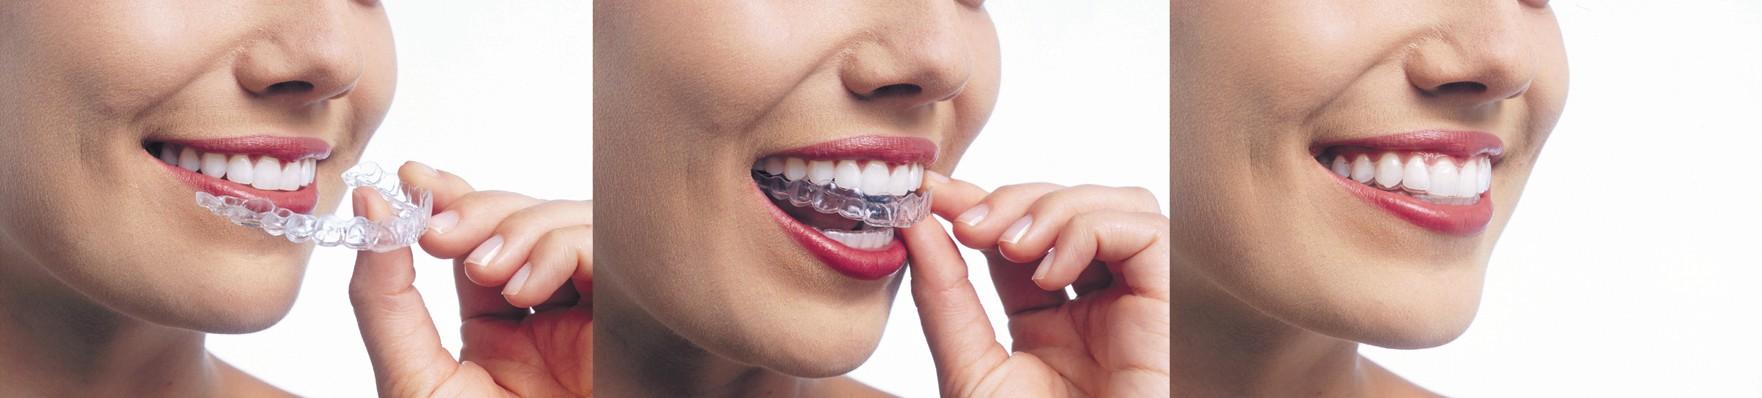 Invasiling Ortodoncia invisible en Dentalcare Clínicas